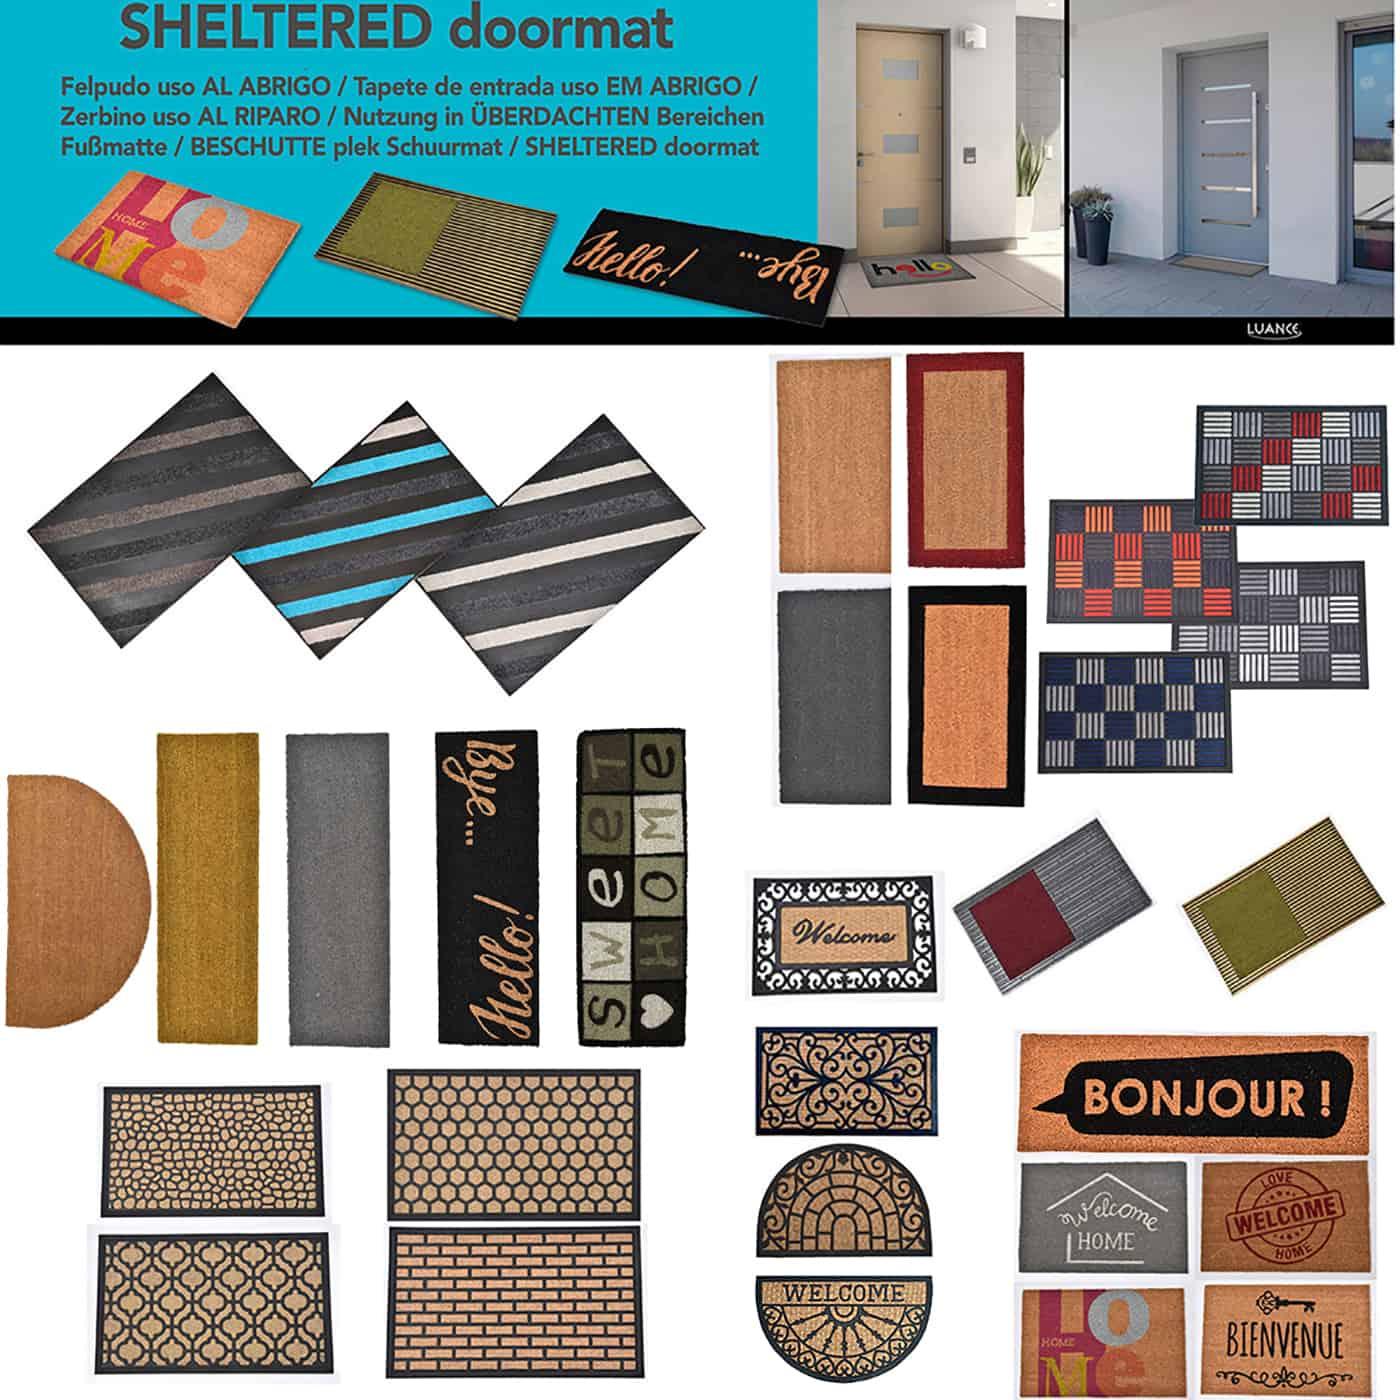 Sheltered Printed Front Door Mat Bienvenue Coir Coco Fibers Rug 24x16 Natural